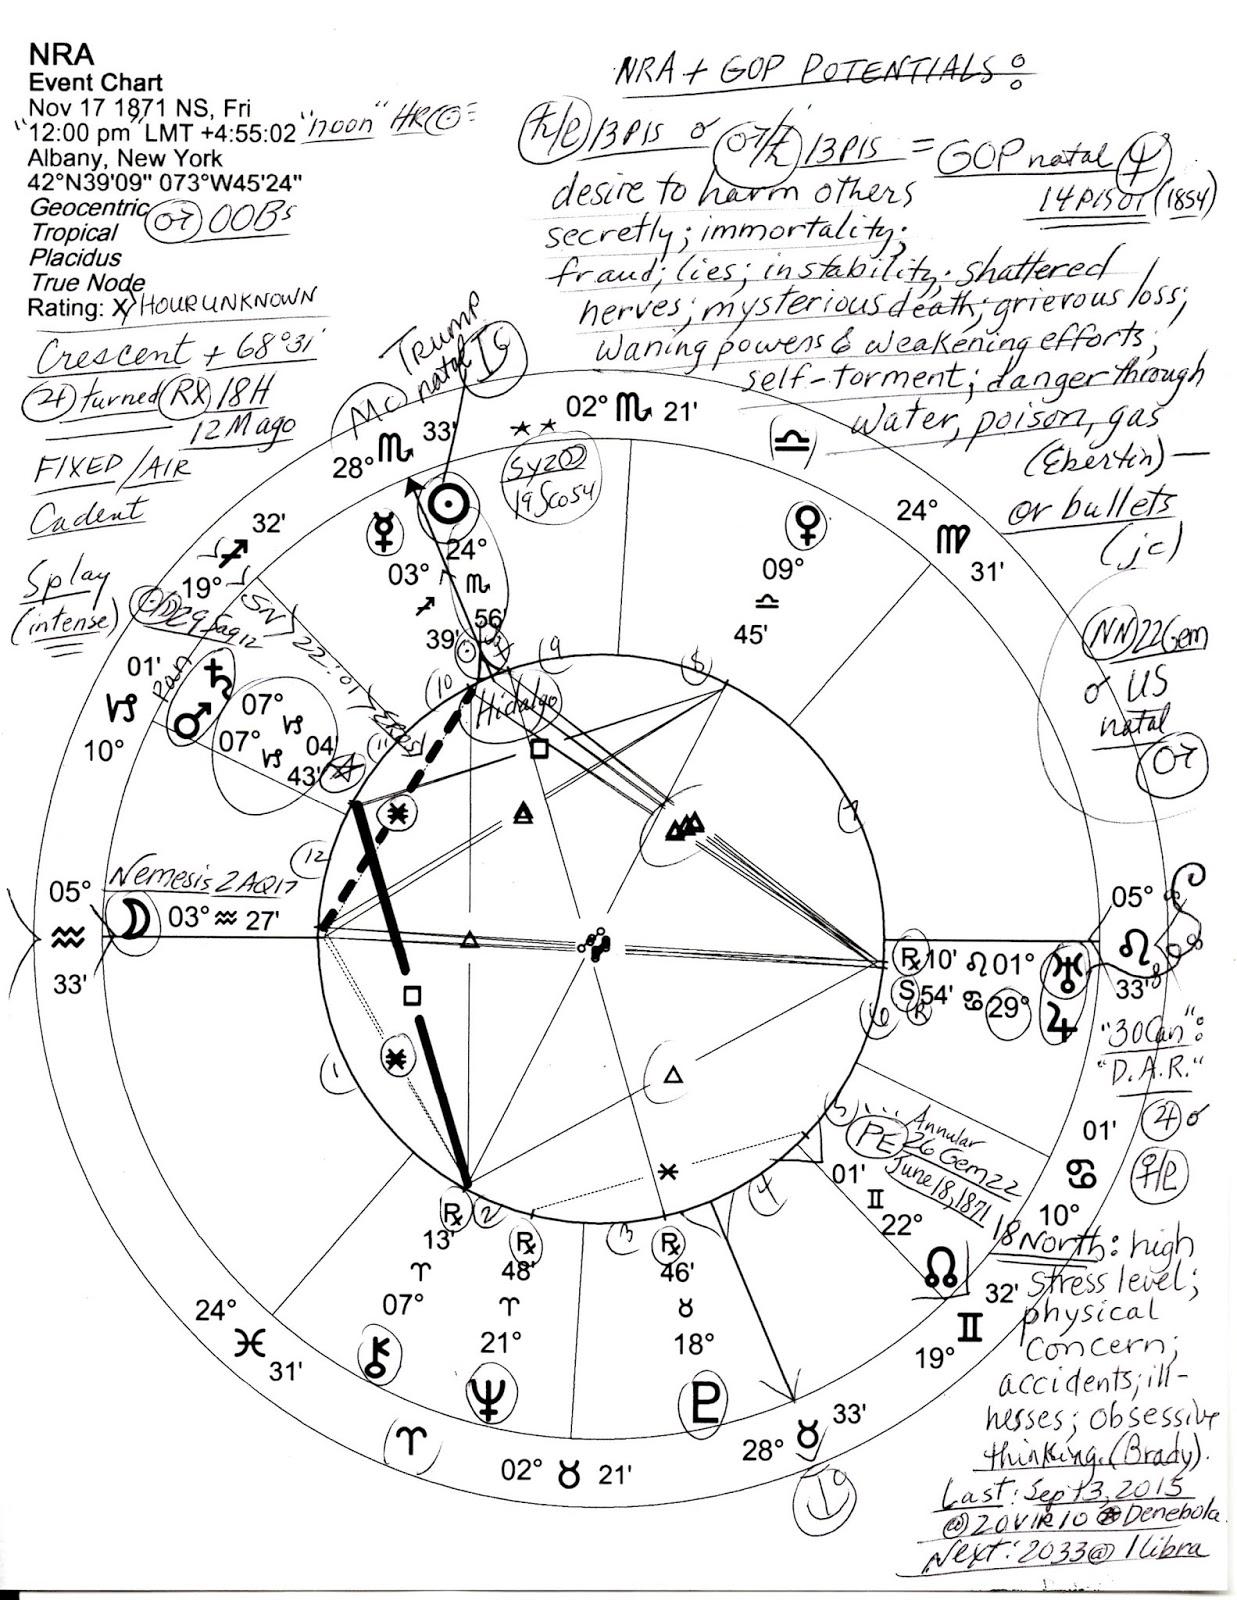 Stars Over Washington: Horoscope of the NRA Nov 17, 1871